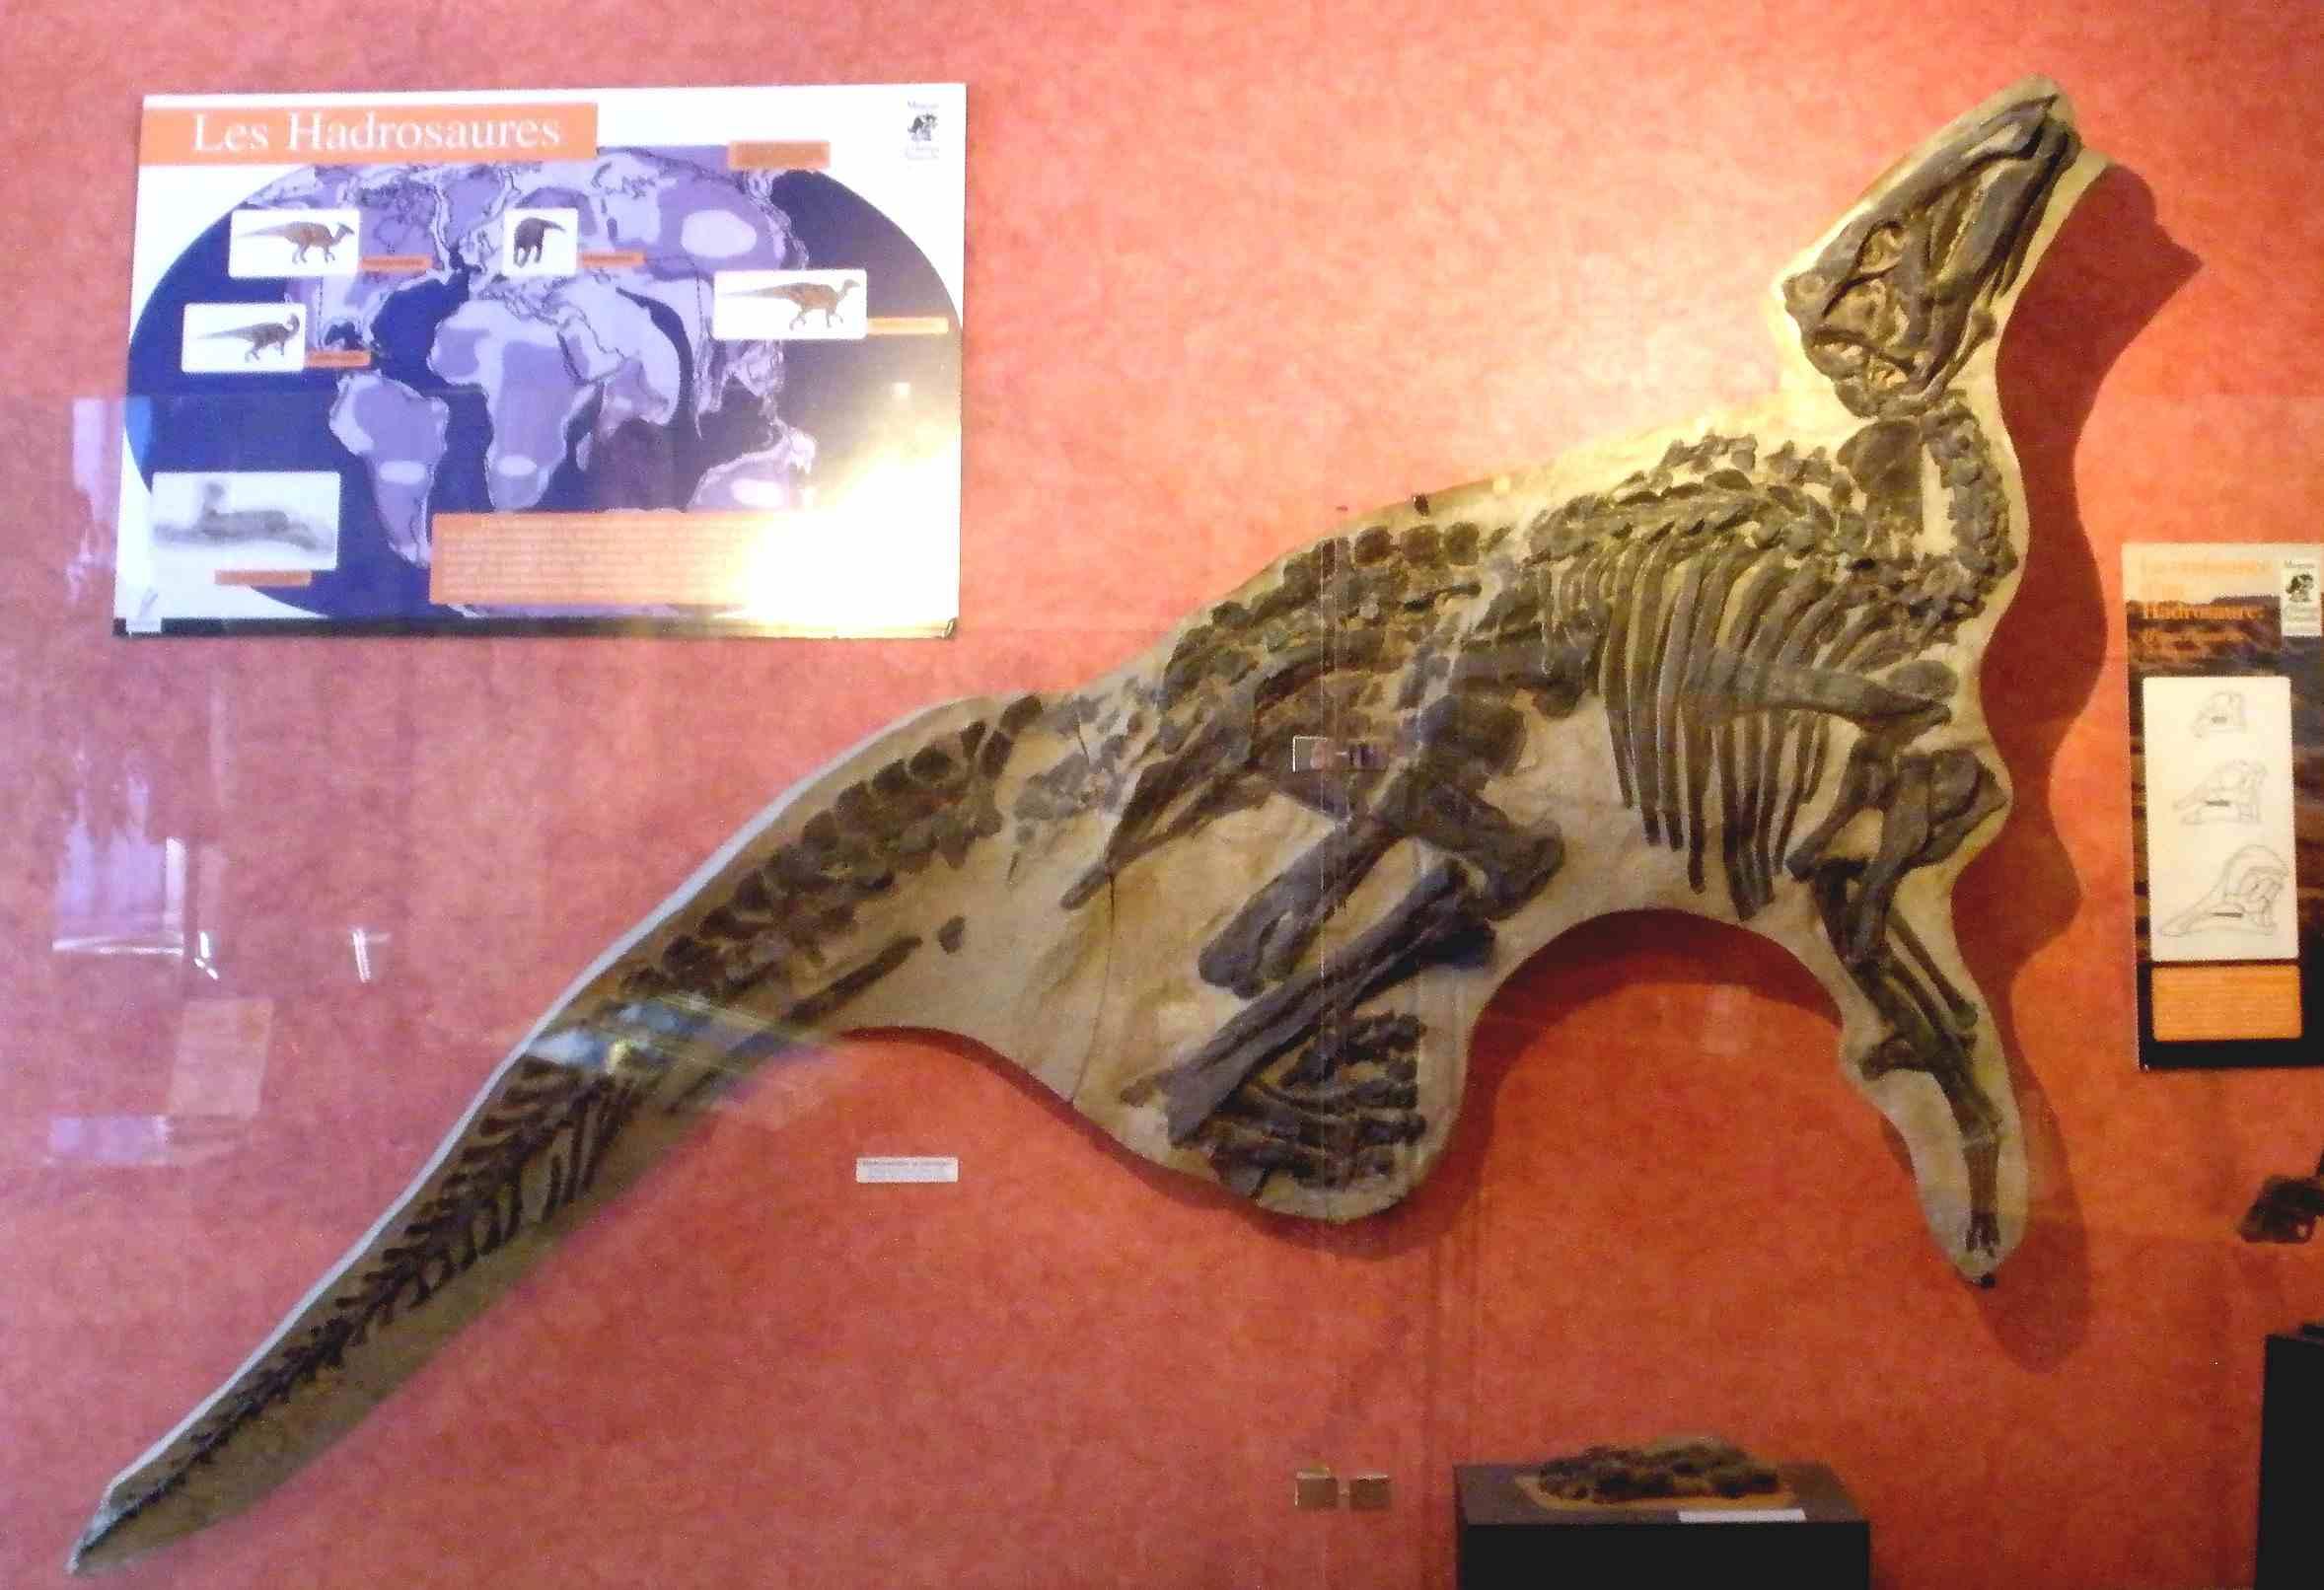 Fossil of Tethyshadros, an extinct ornithopod